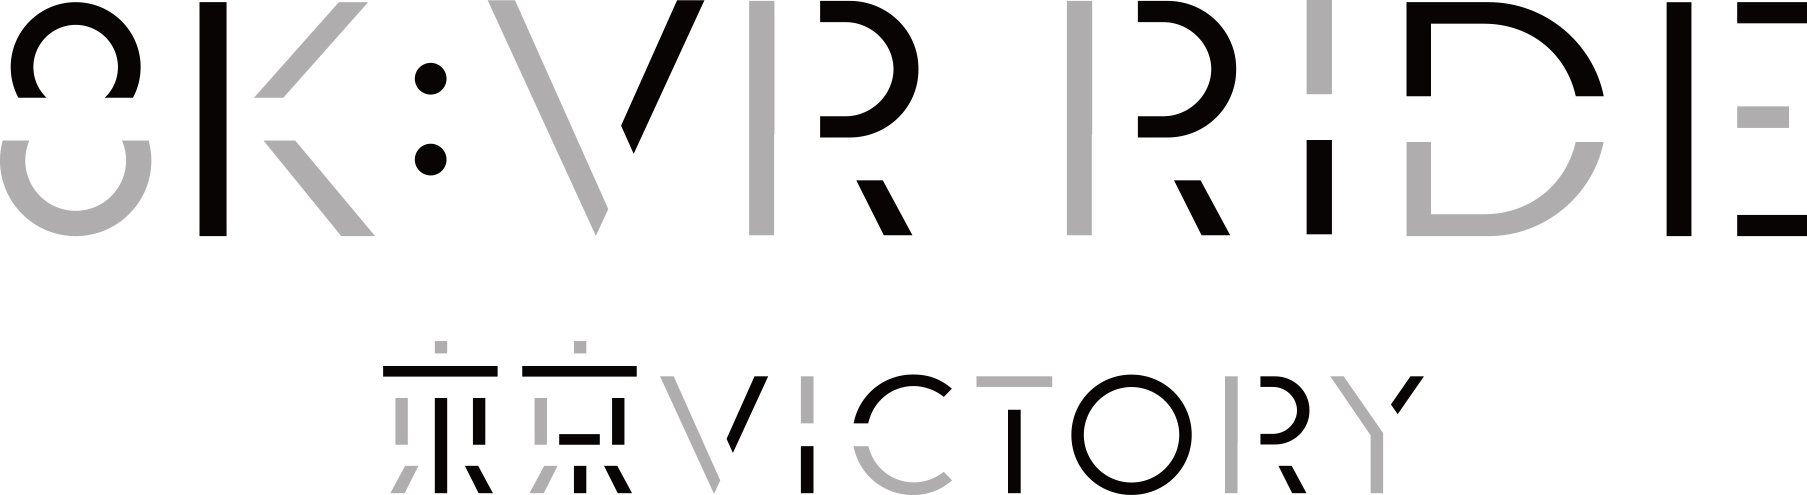 8K:VR ライド ロゴ